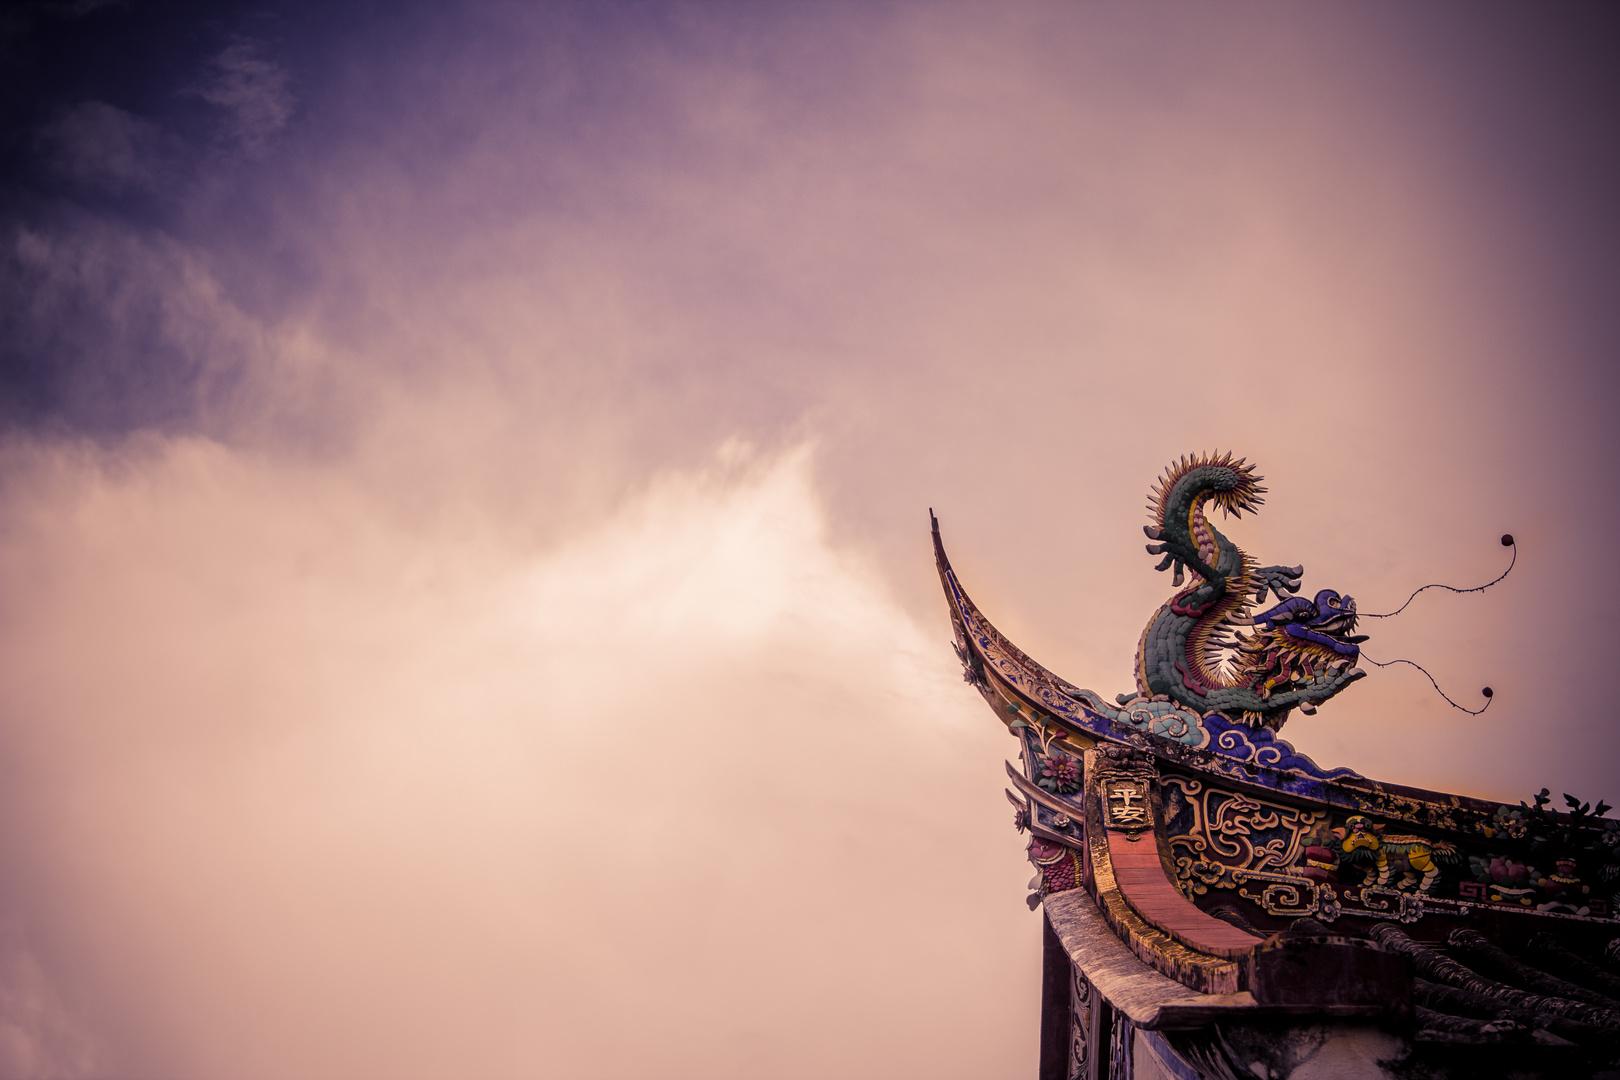 Snake Temple - Penang - Malaysia